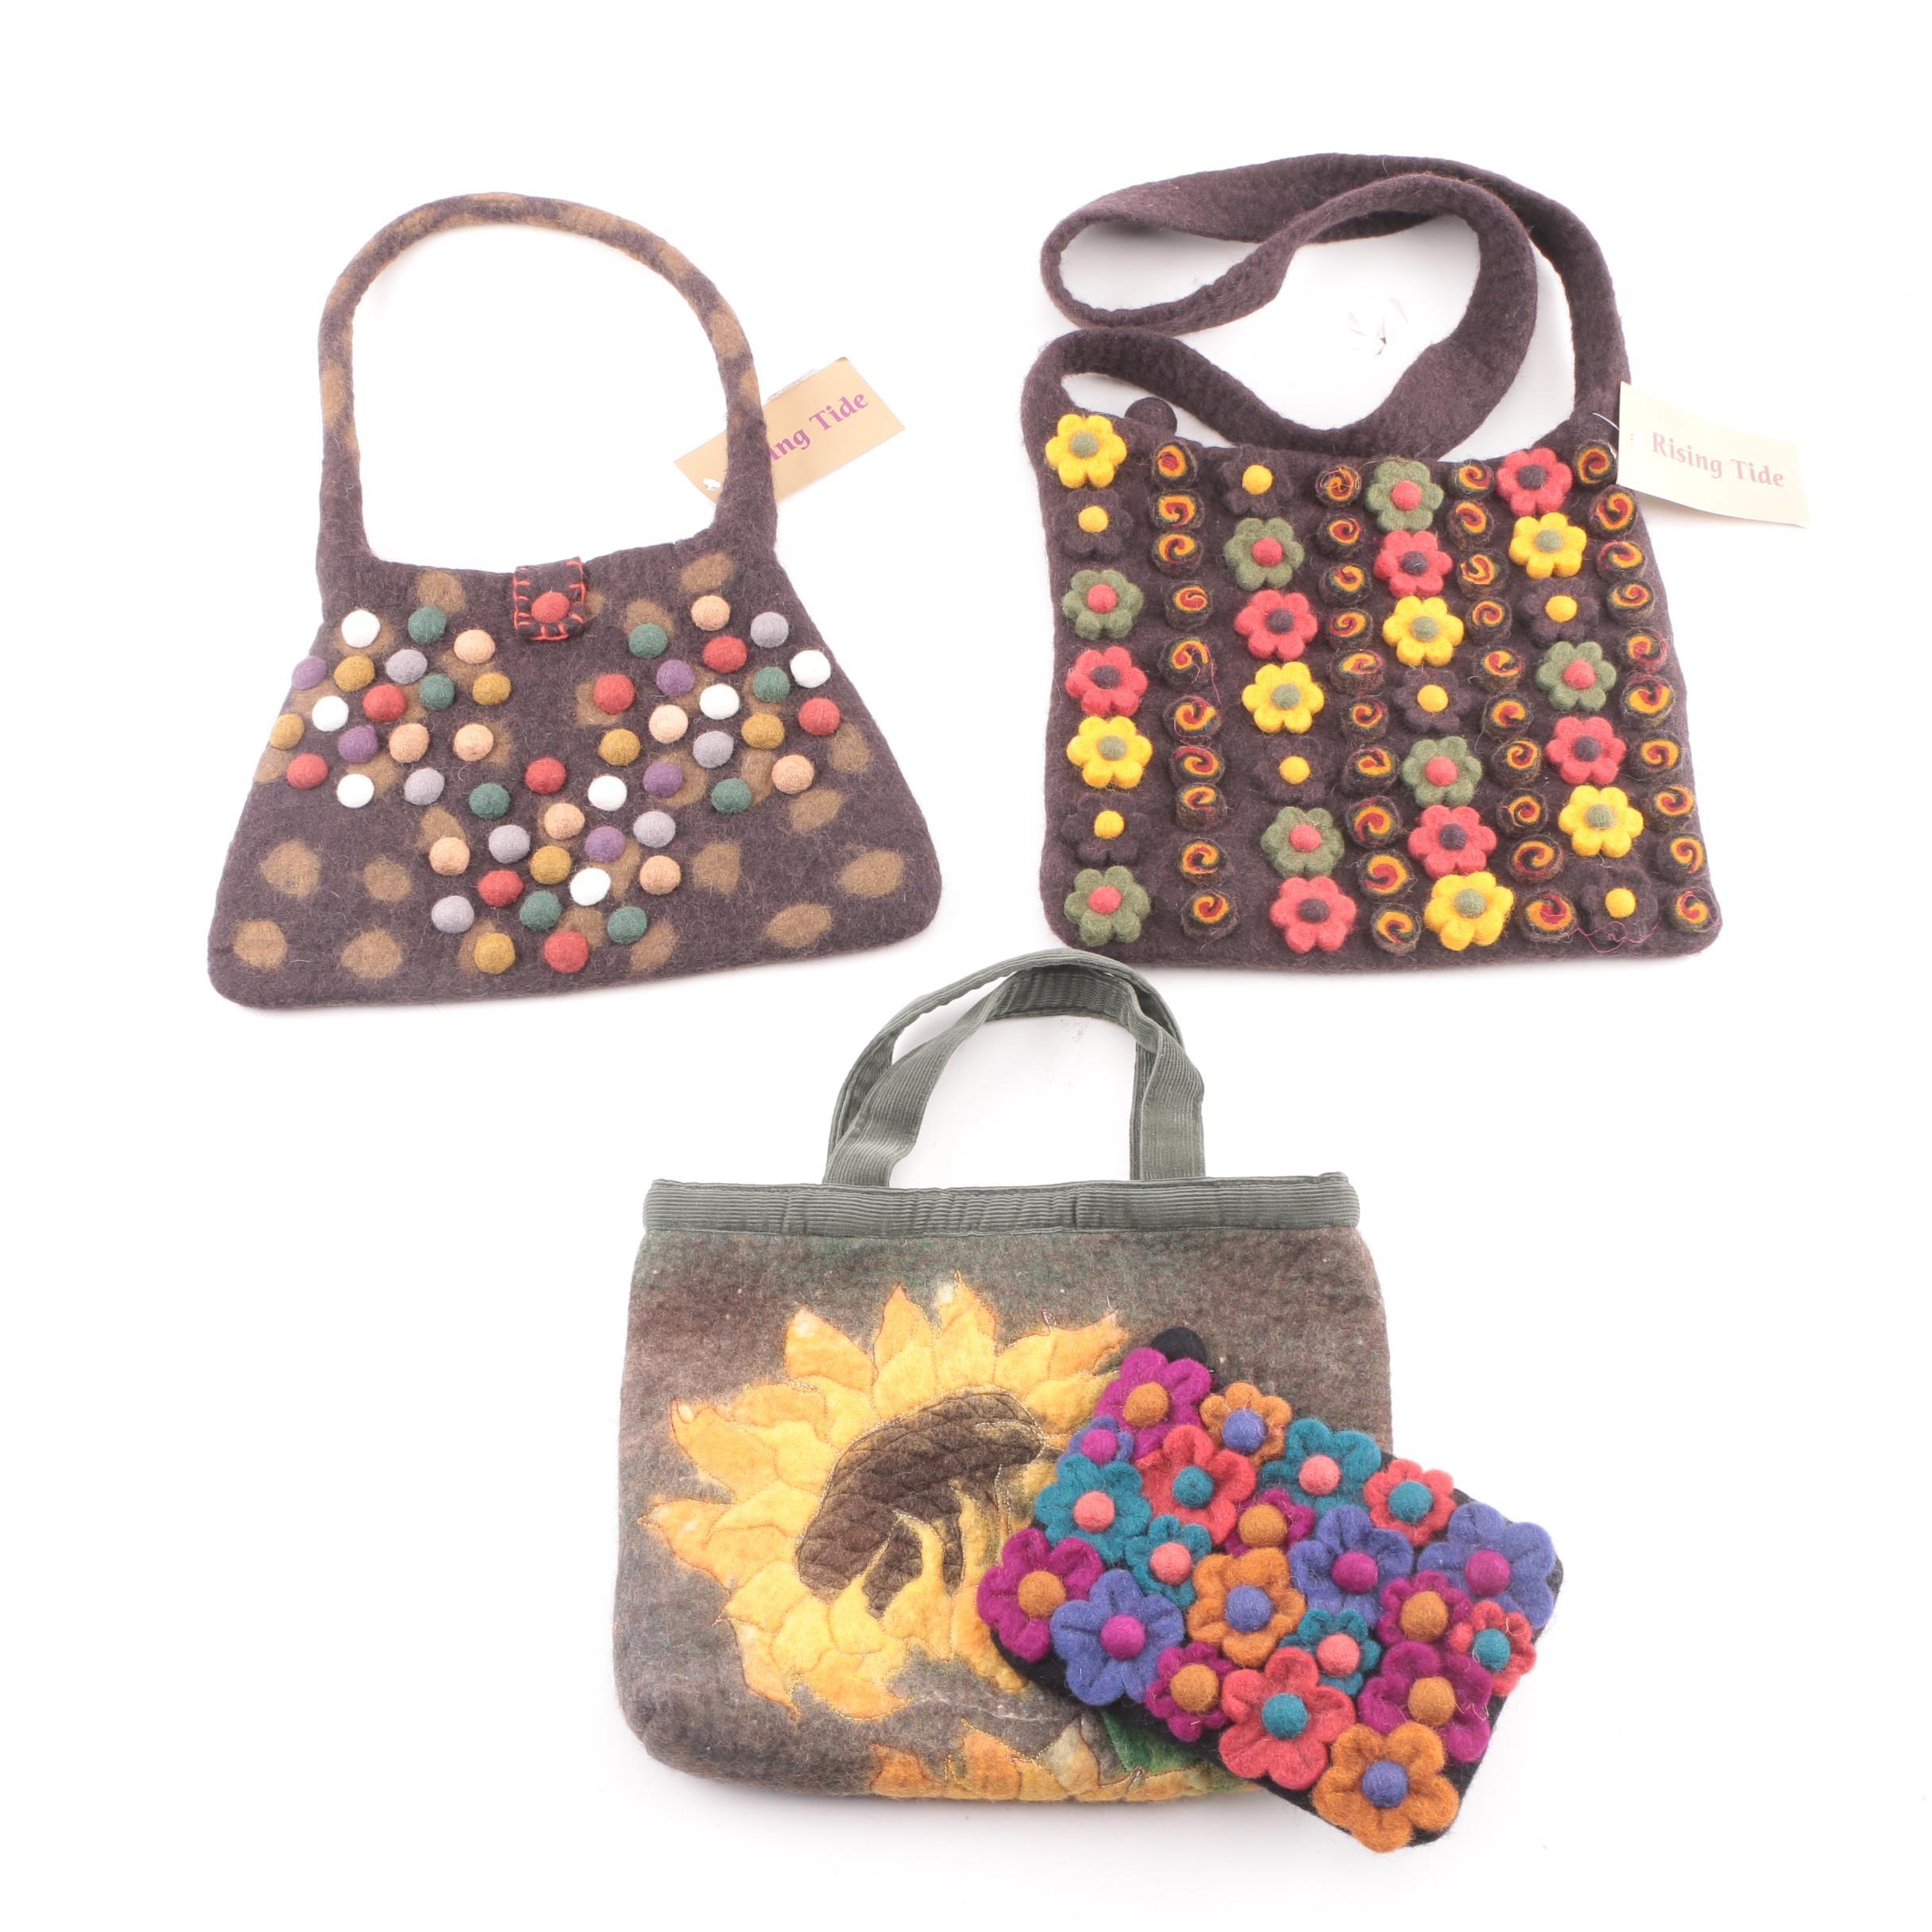 Rising Tide Wool Handbags and Coin Purse